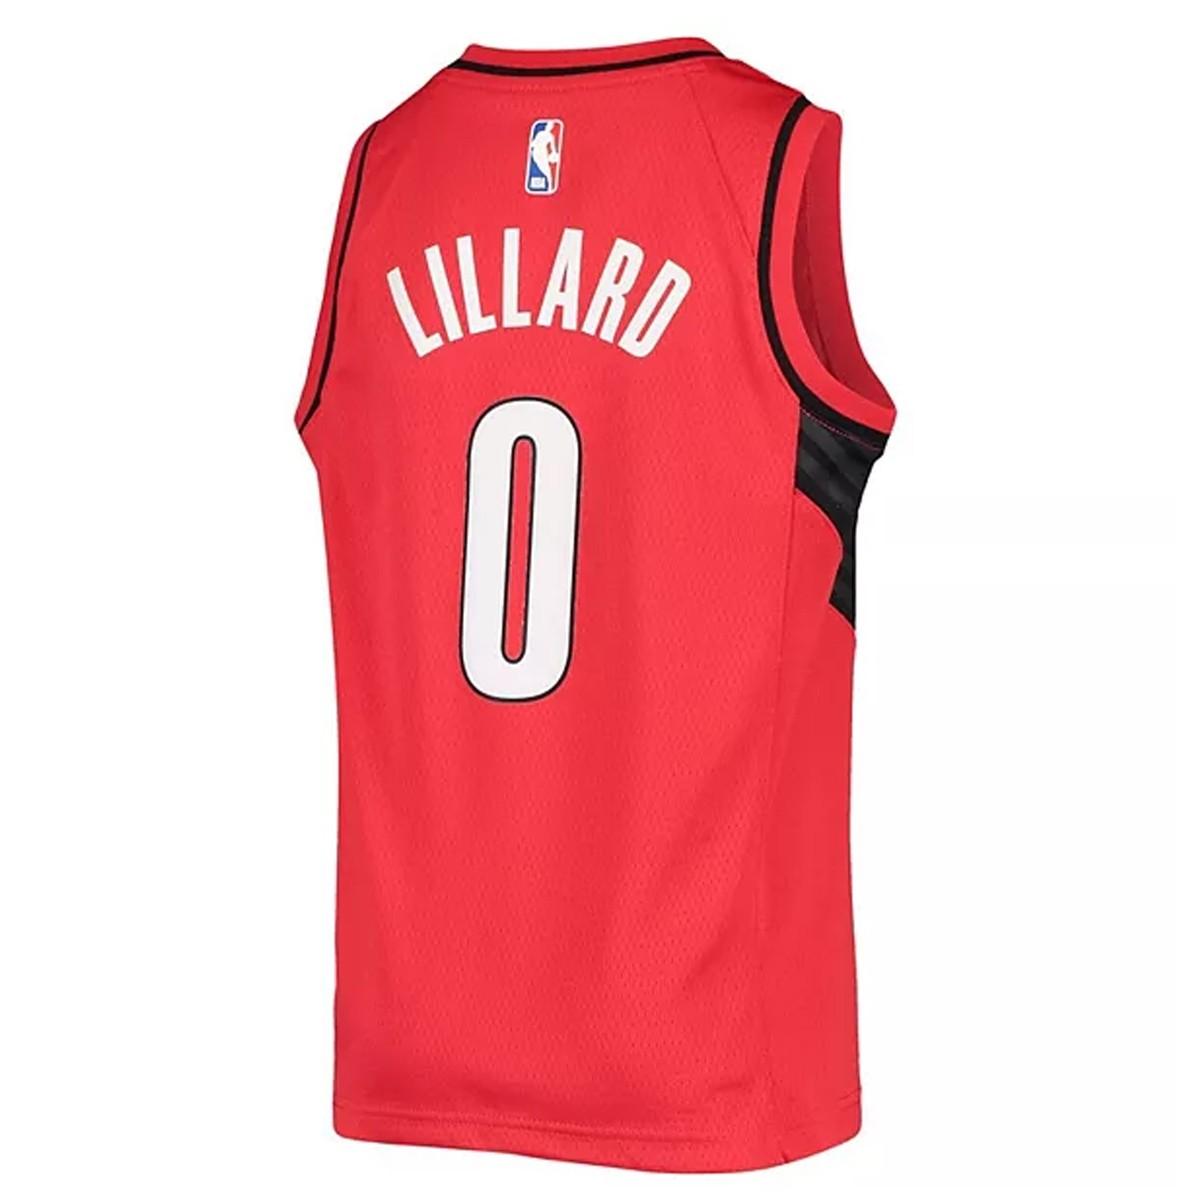 Jordan Jr NBA Blazers Swingman Jersey Damian Lillard 'Statement Edition'-EY2B7BXAP-PORDL